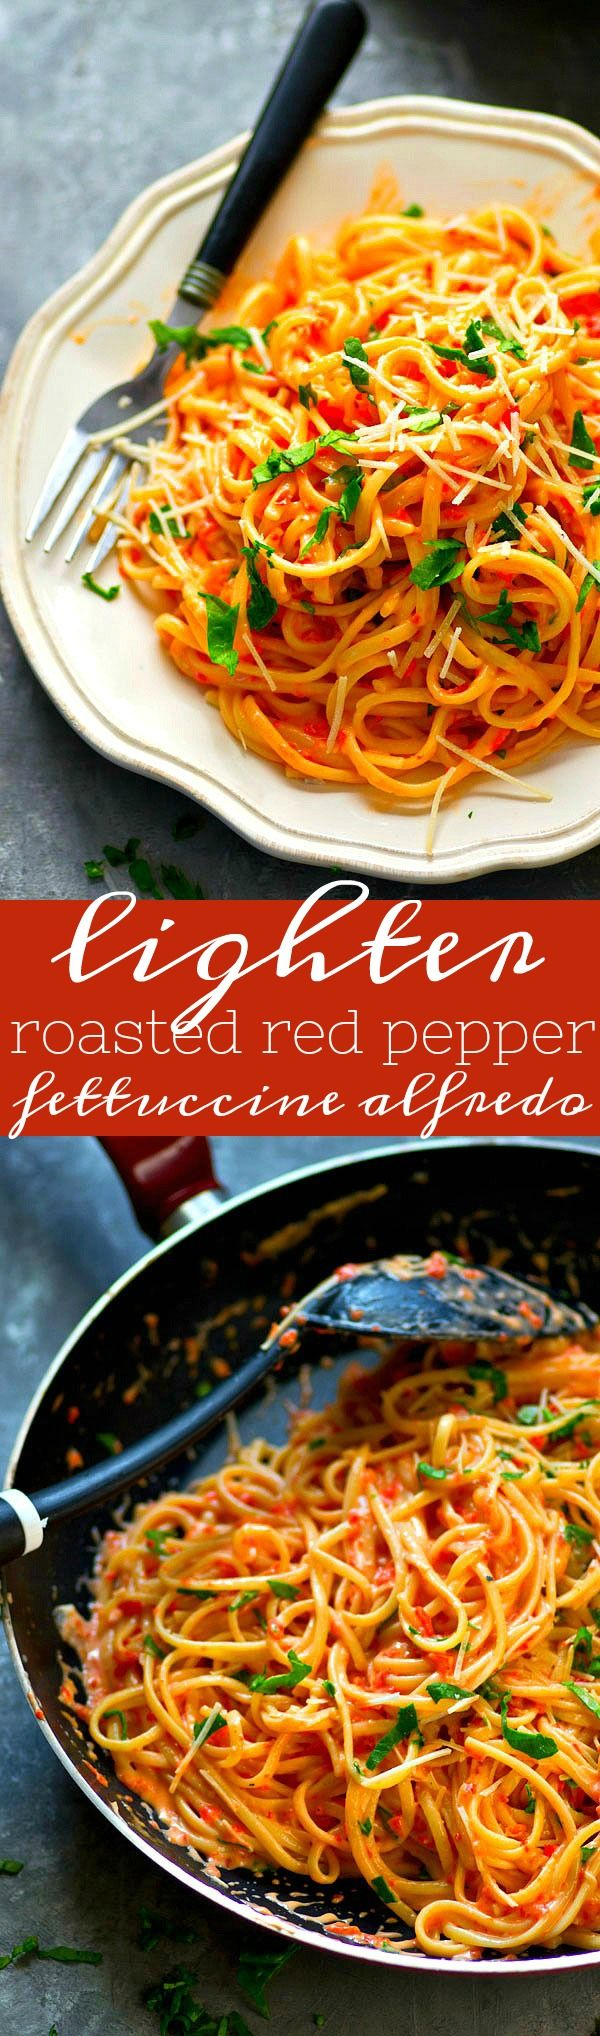 Lighter Roasted Red Pepper Fettuccine Alfredo Recipe Stuffed Peppers Pasta Dishes Best Pasta Recipes